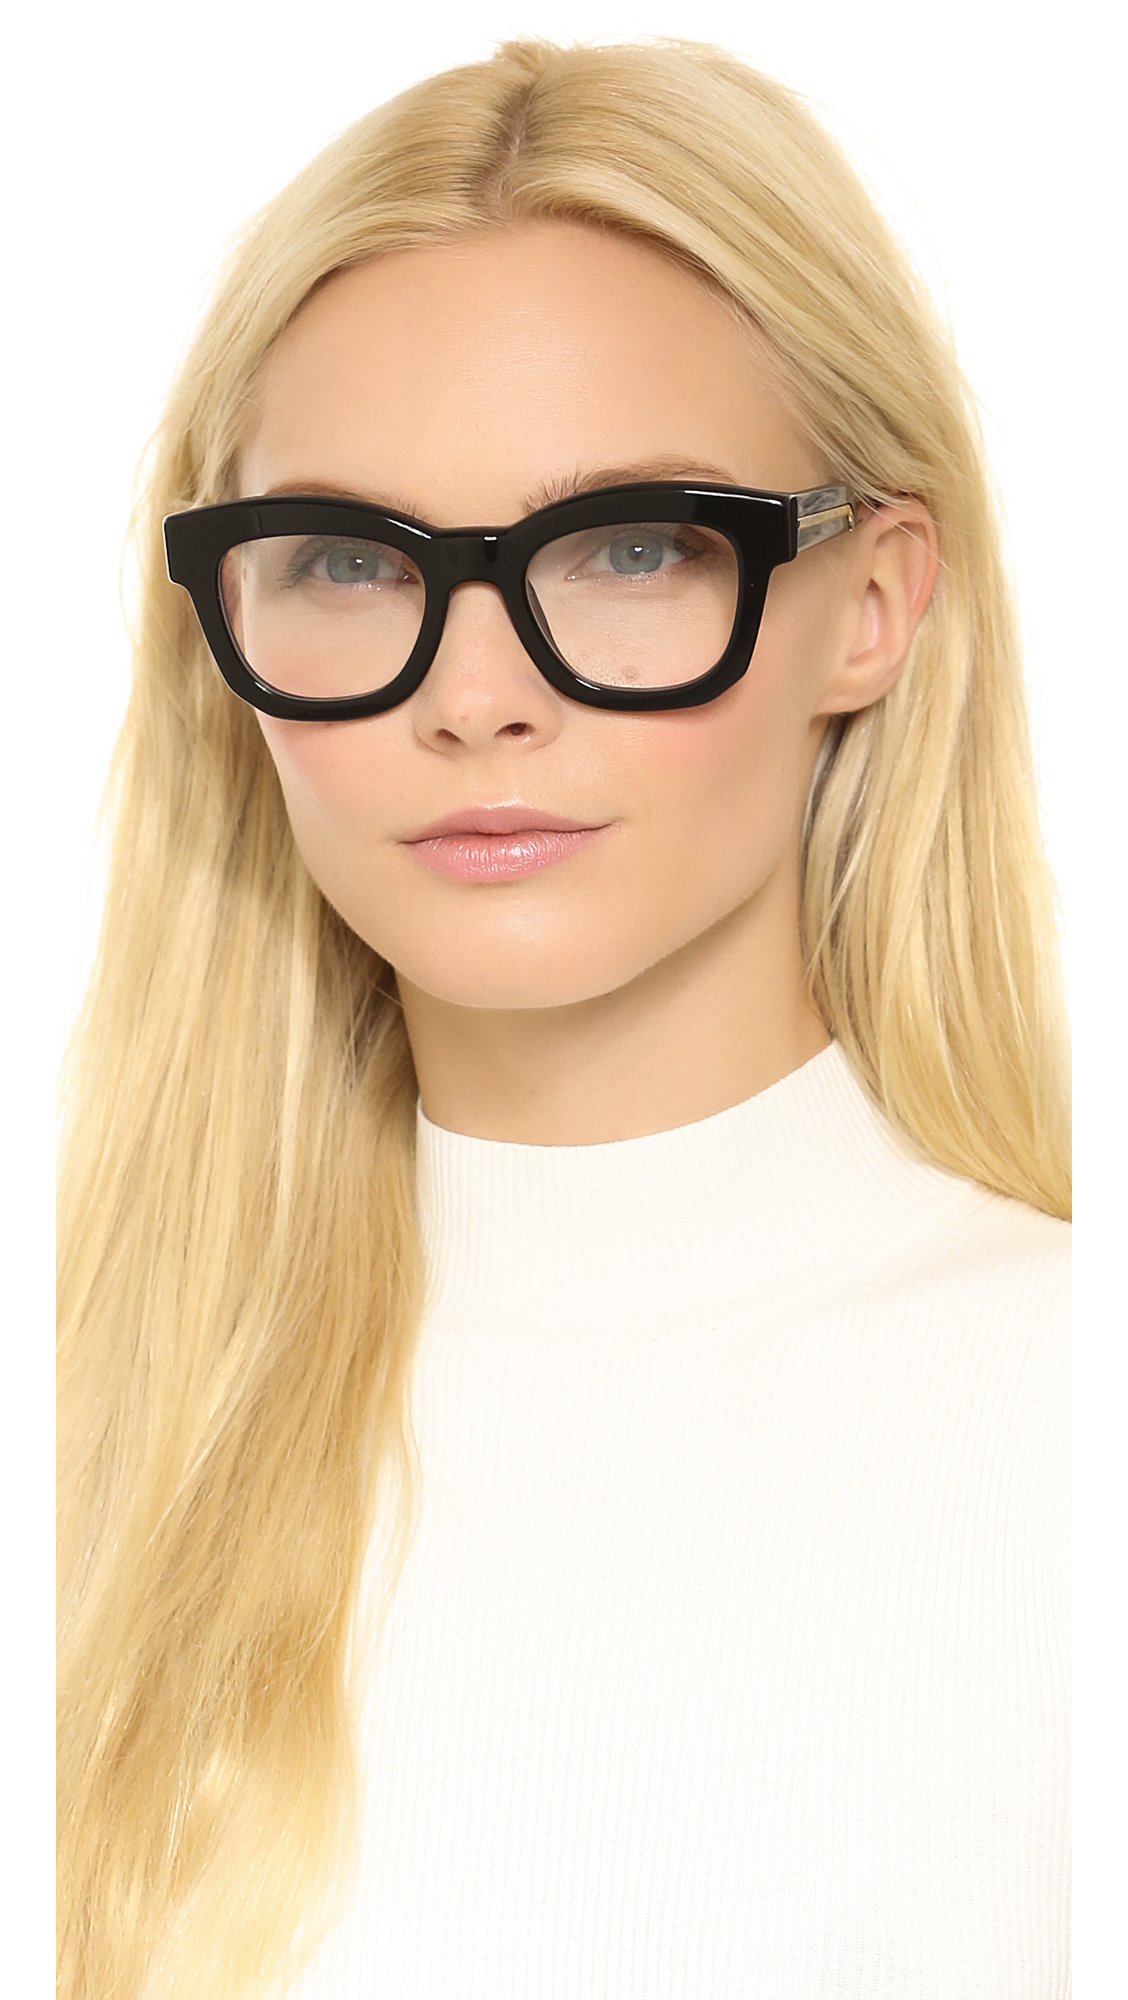 aa2d7ec8c25 Stella McCartney Thick Frame Glasses